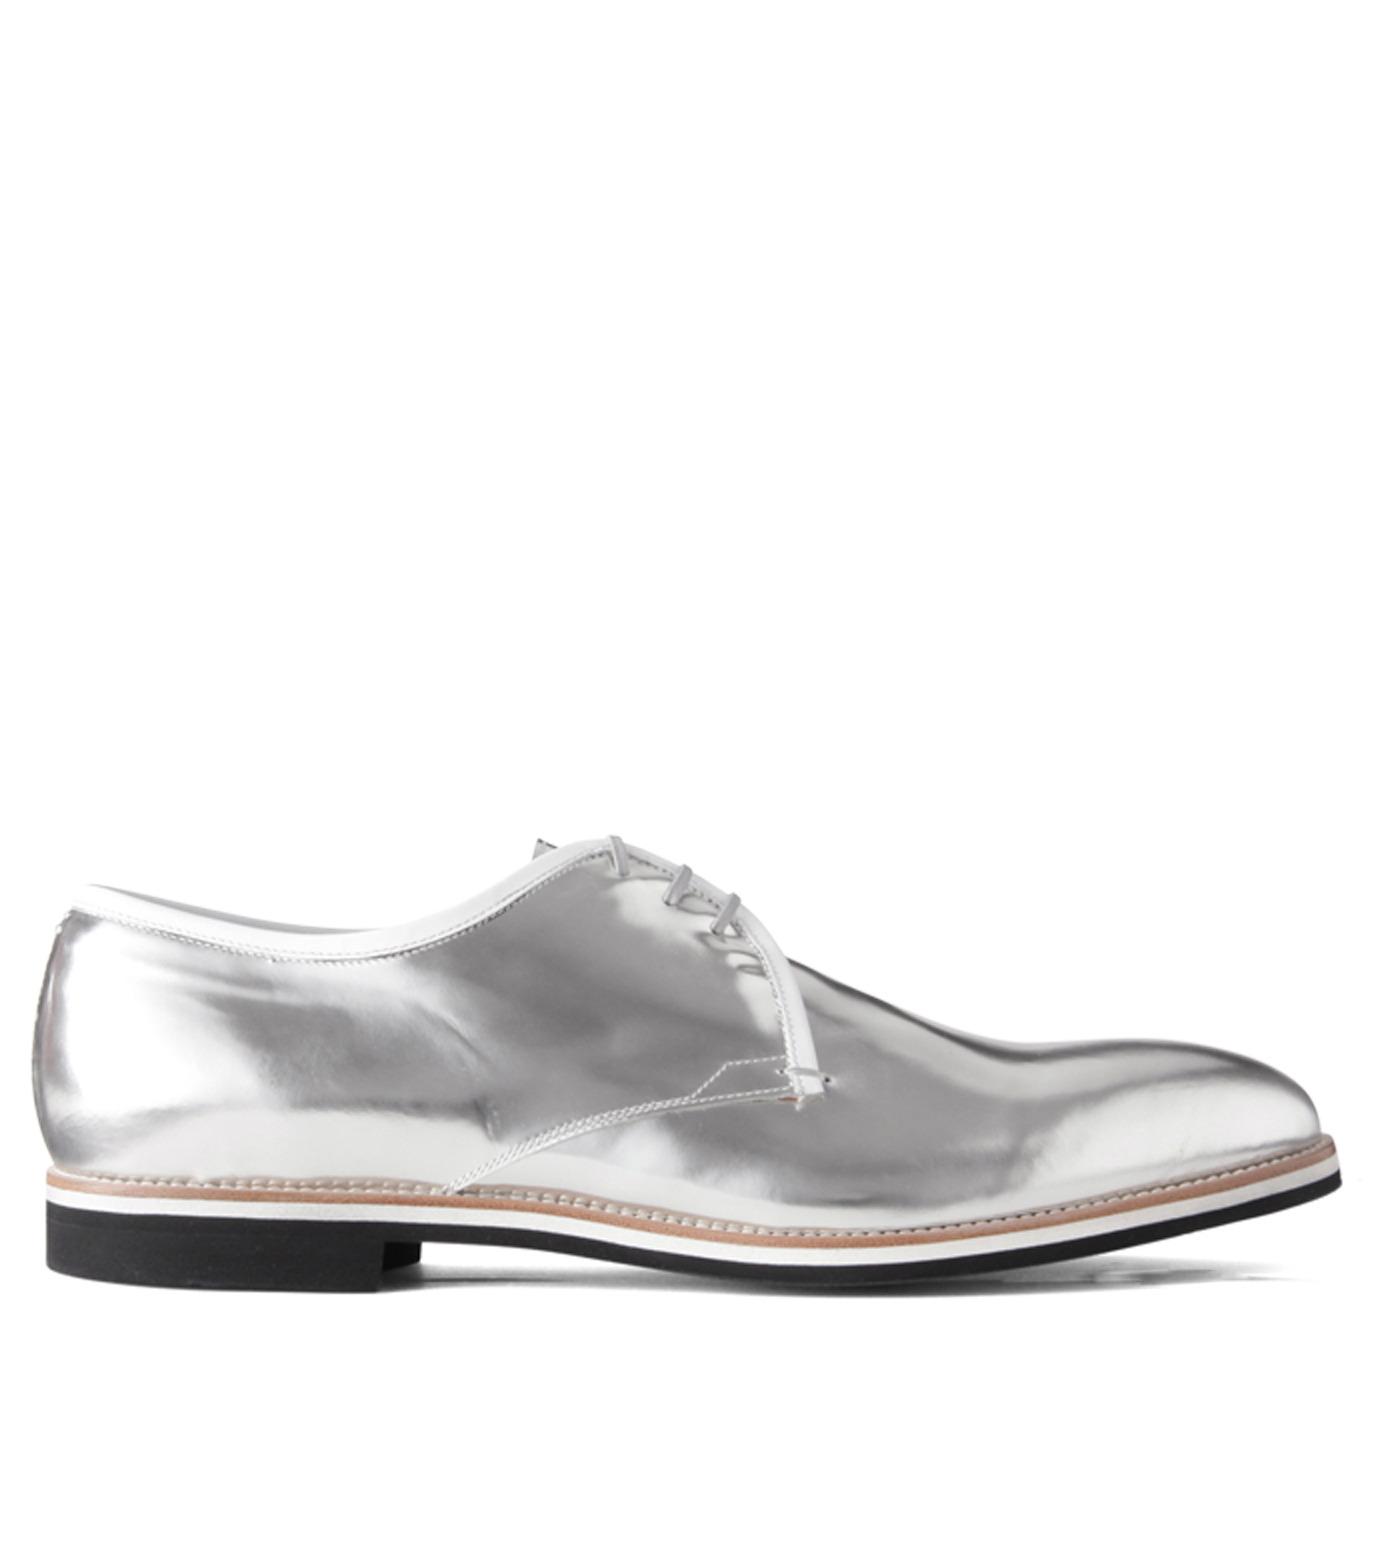 Sergio Rossi(セルジオ ロッシ)のDerby-SILVER(シューズ/shoes)-A61190-1 拡大詳細画像1